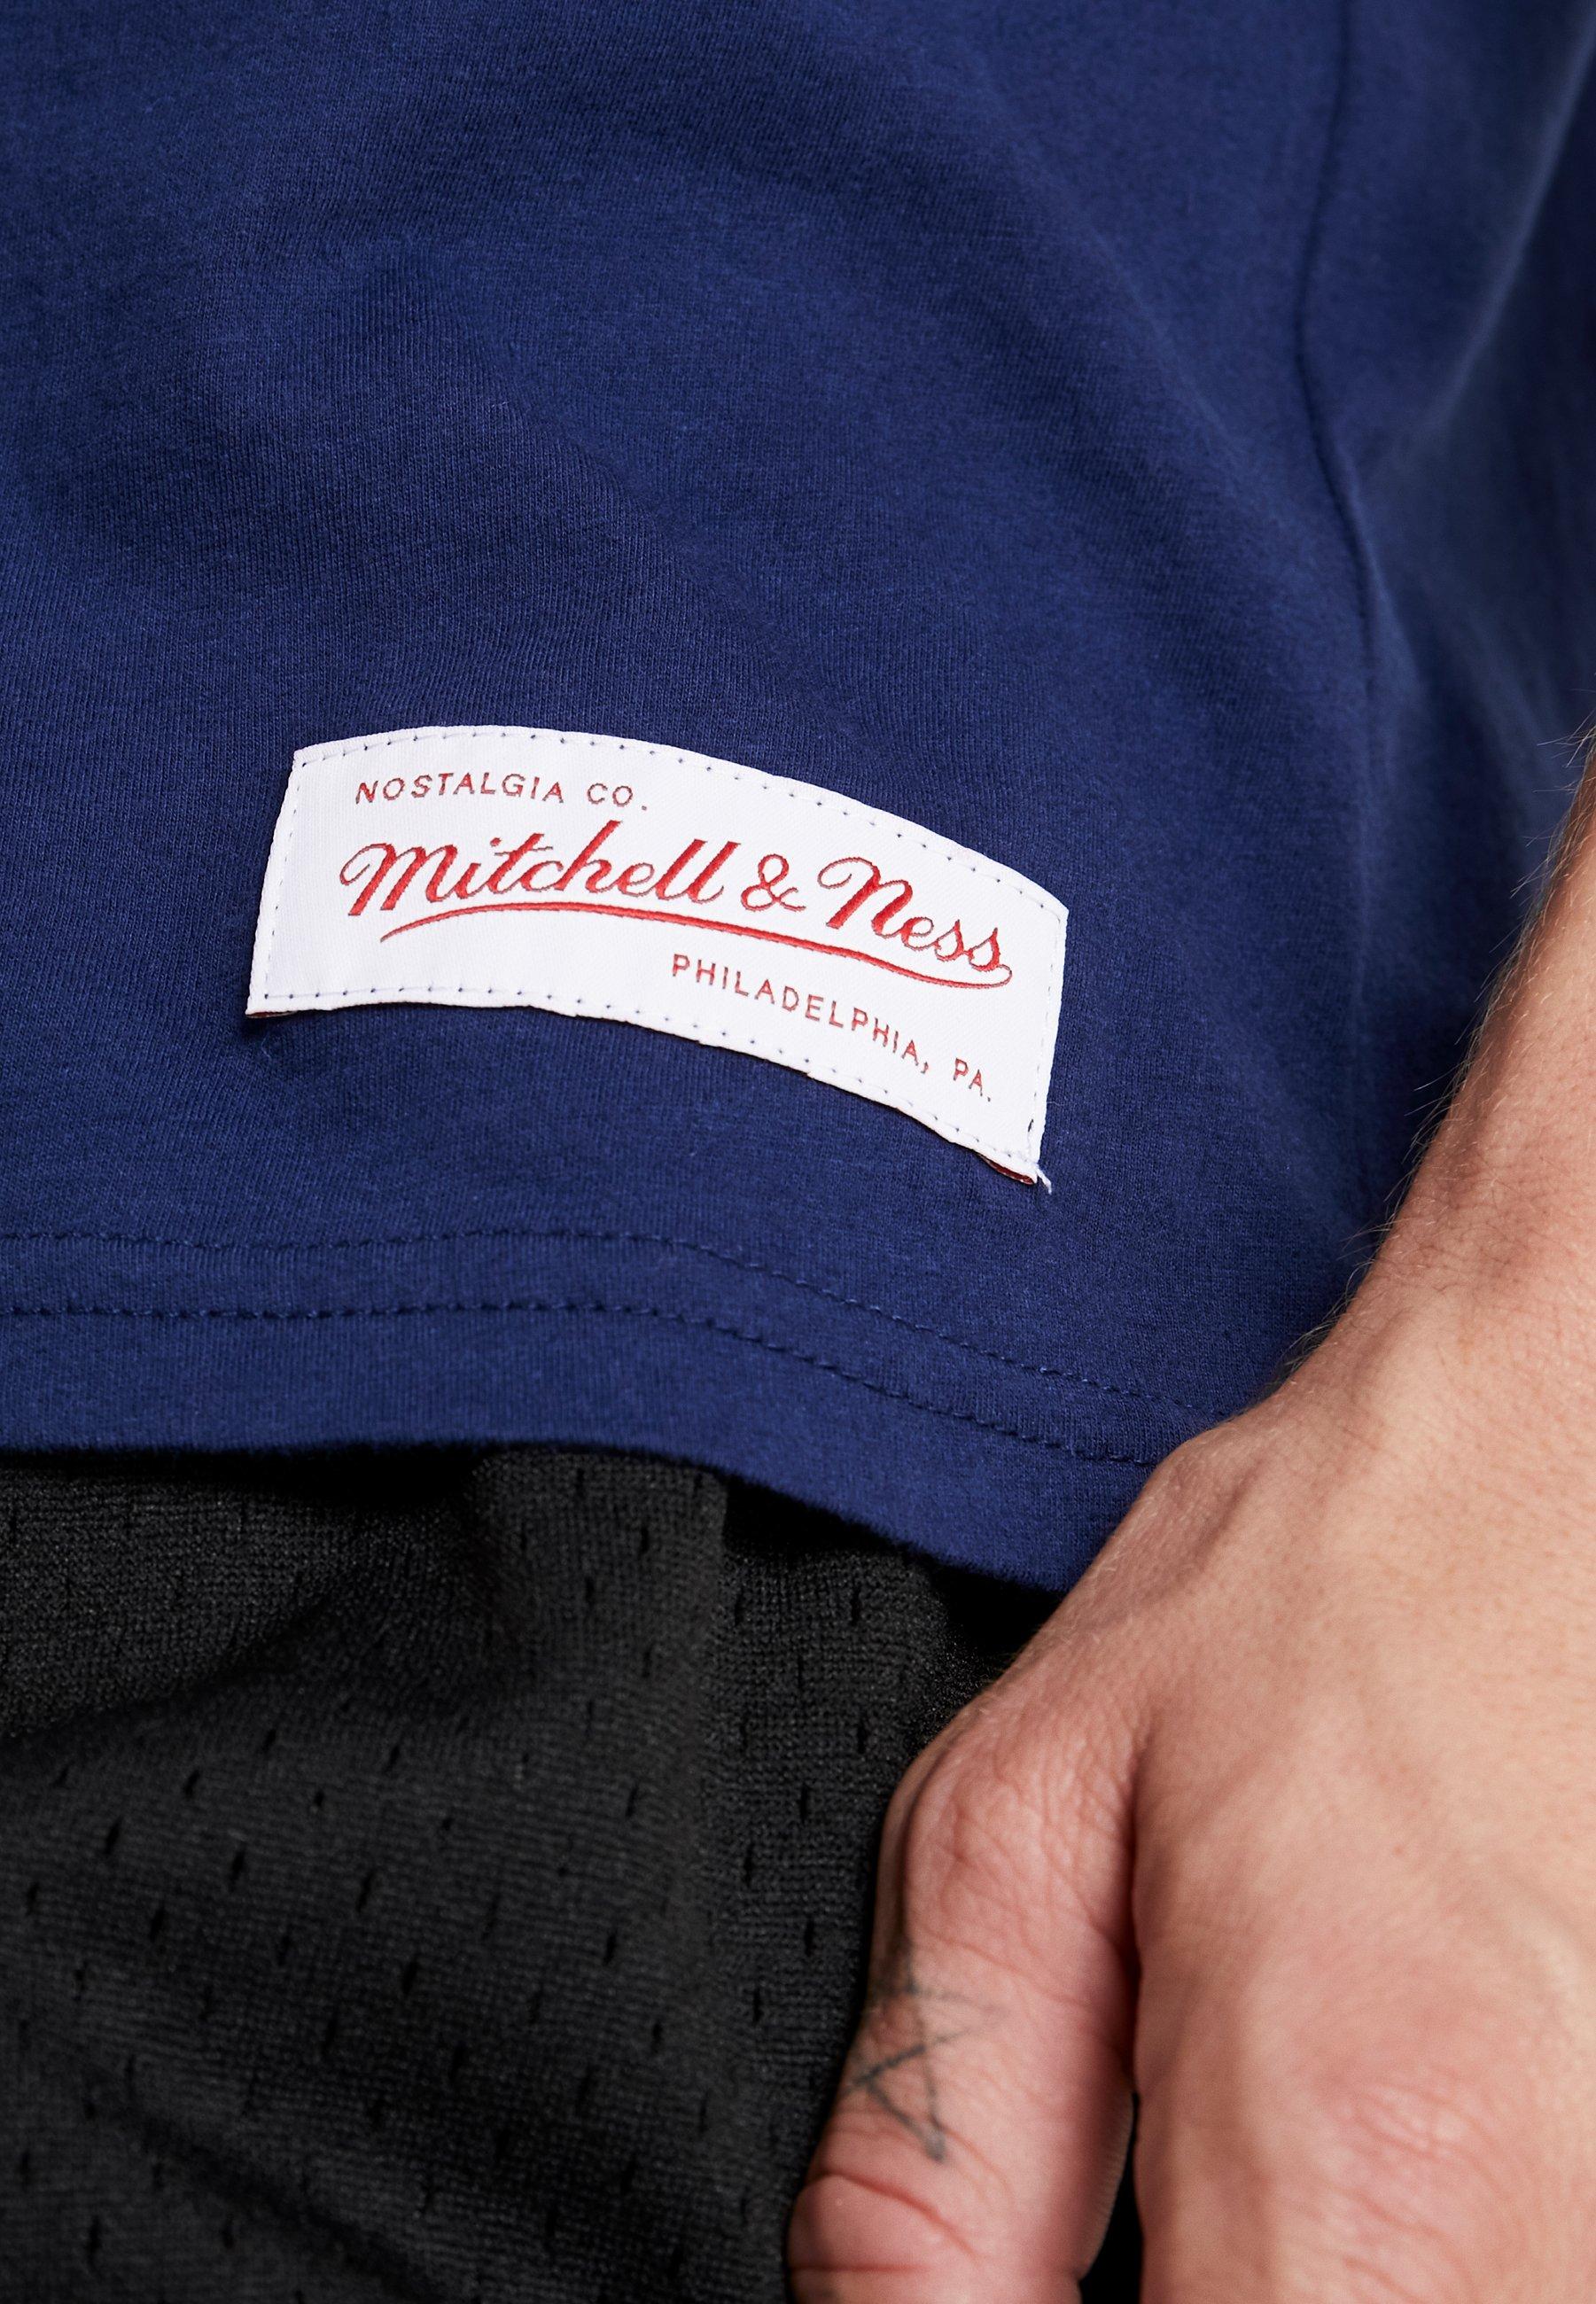 Mitchell & Ness Ncaa Michigan The Overtime Win Tee - T-shirt Print Navy rWfsQJ1L wxOpqiWo